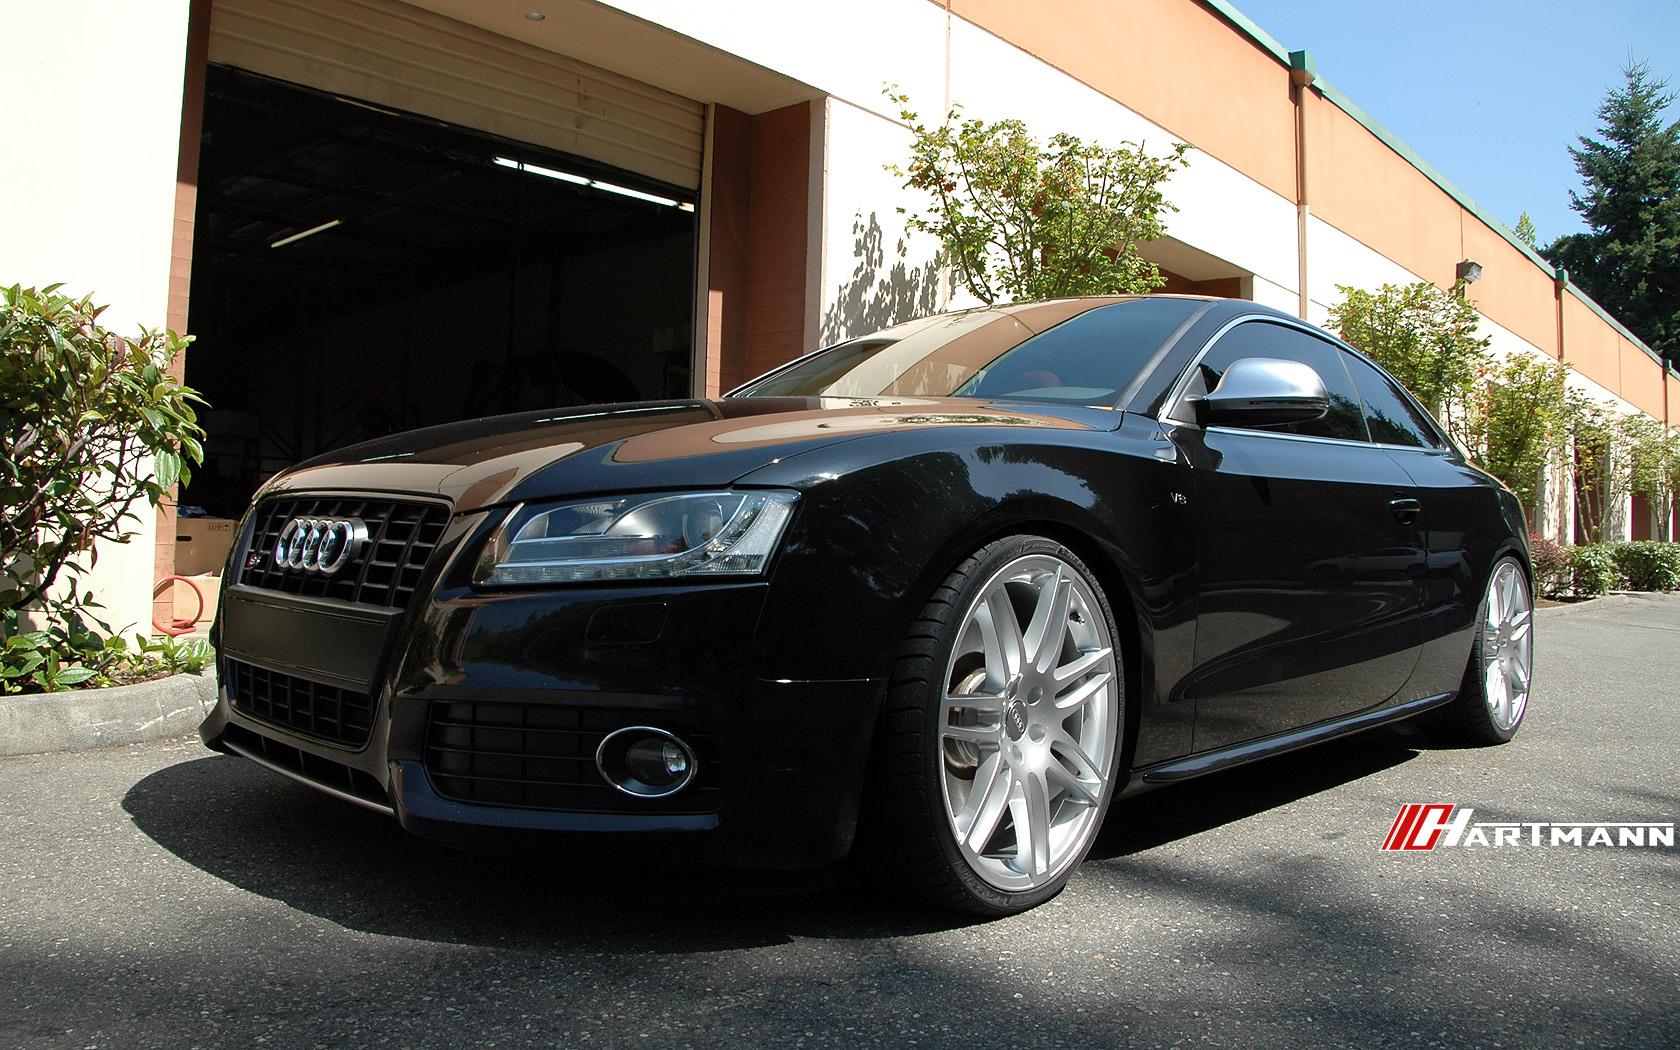 Audi b8 s5 hartmann wheels hrs4 252 20 re1 hwm